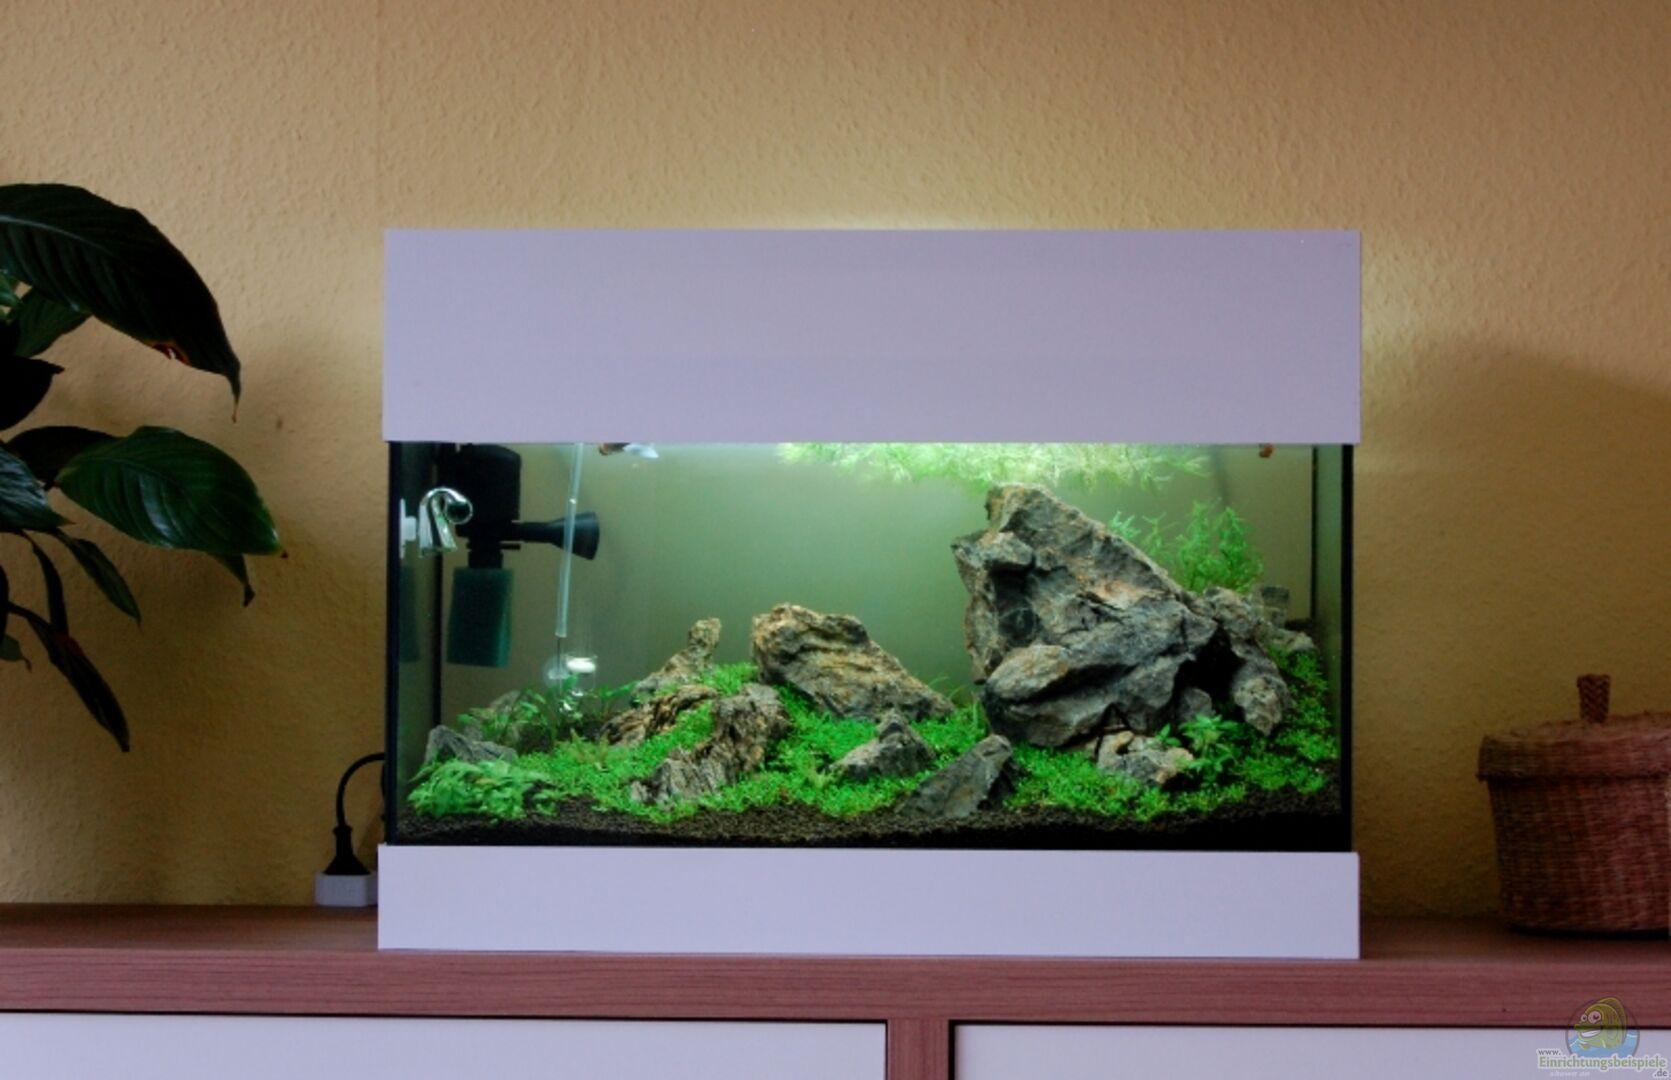 aquarium von kuro schio 20678 berge im glaskasten. Black Bedroom Furniture Sets. Home Design Ideas